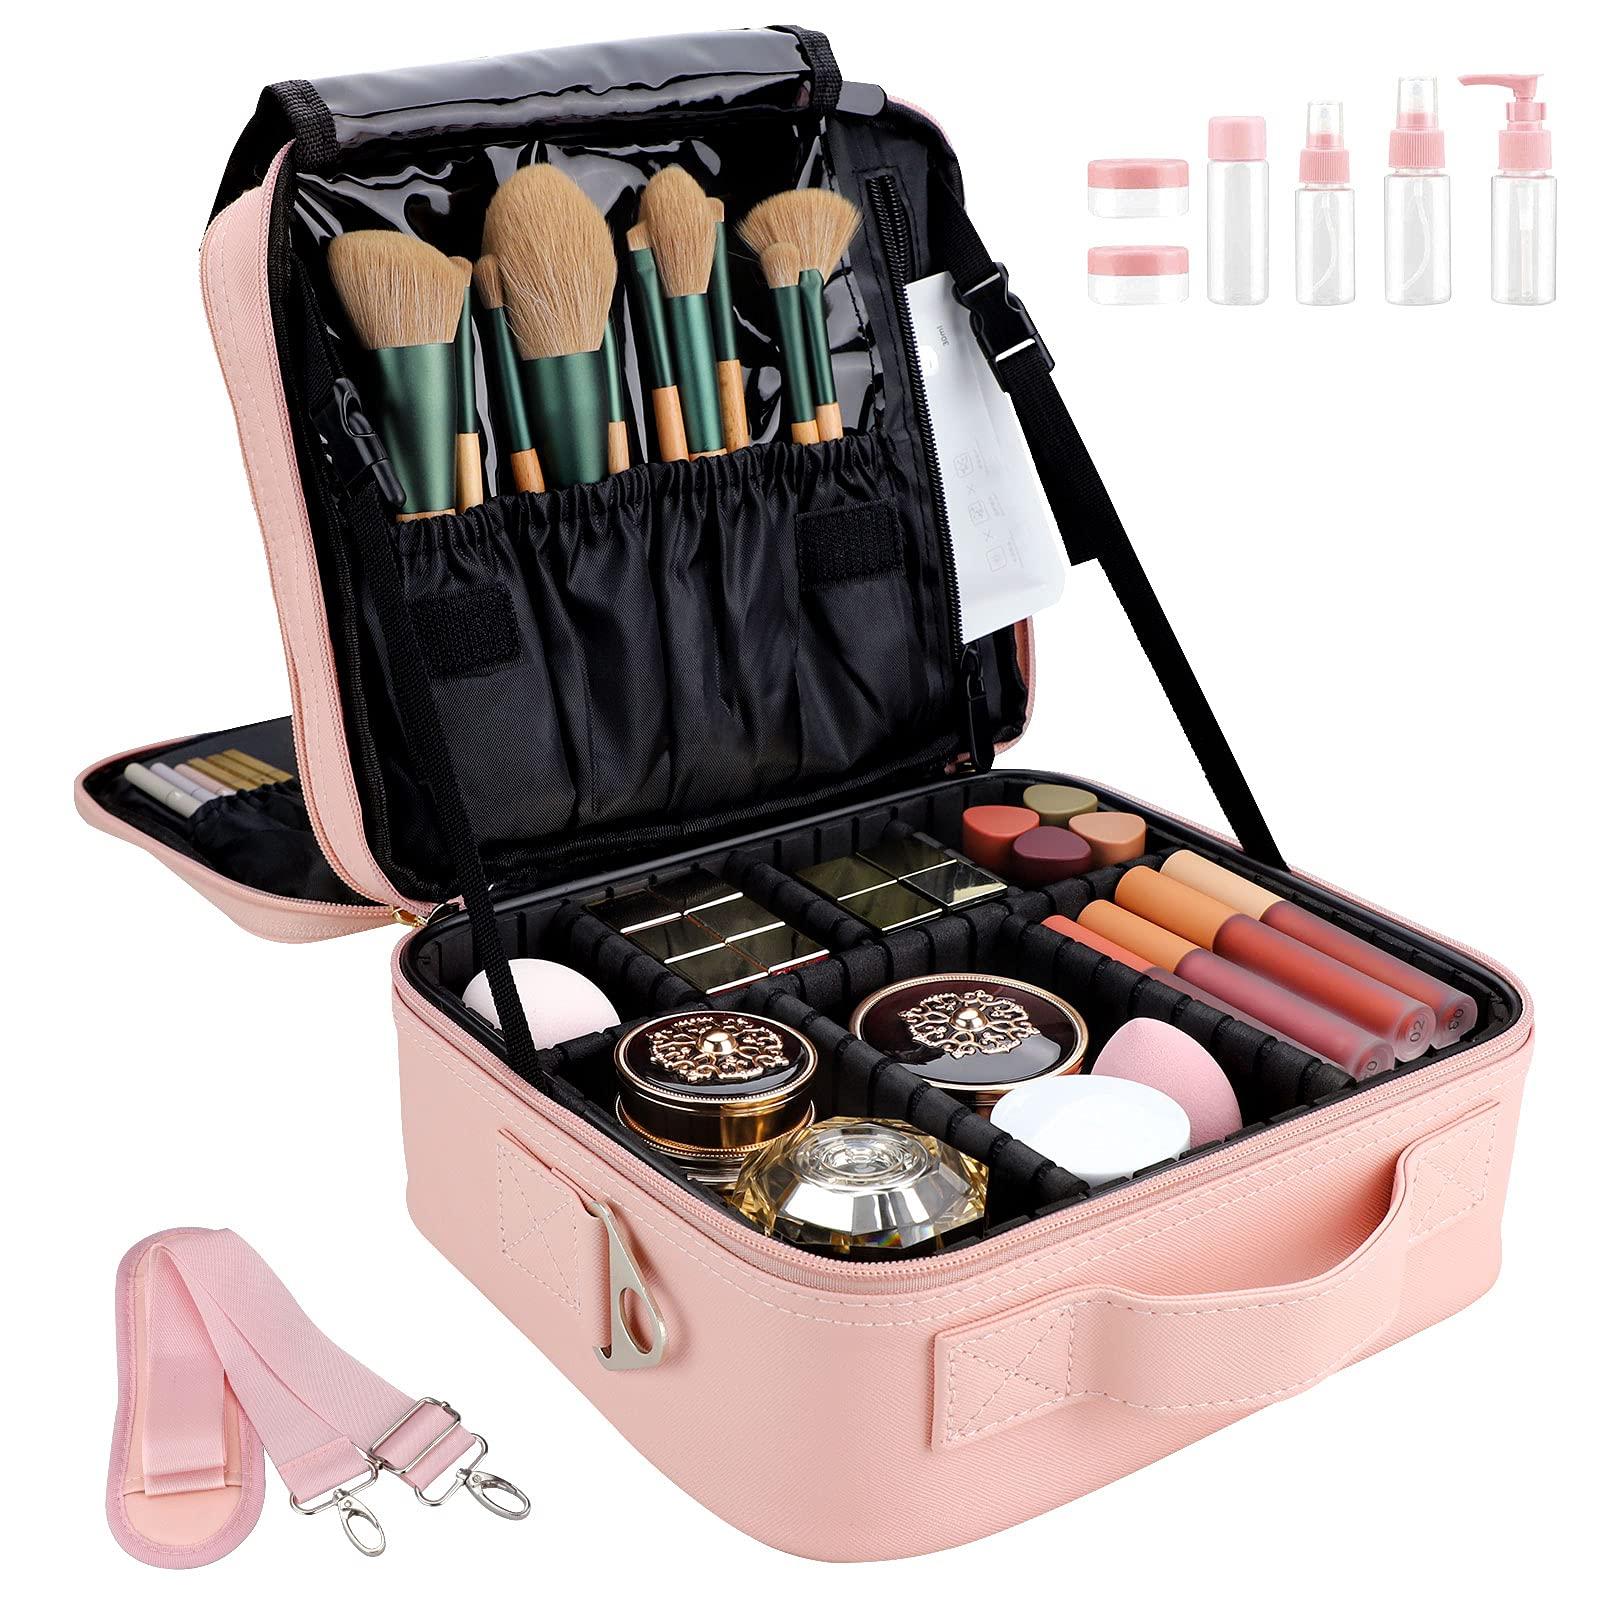 OEWOER Travel Makeup Bag 10.2 Makeup Organizer Case Portable Makeup Train Case